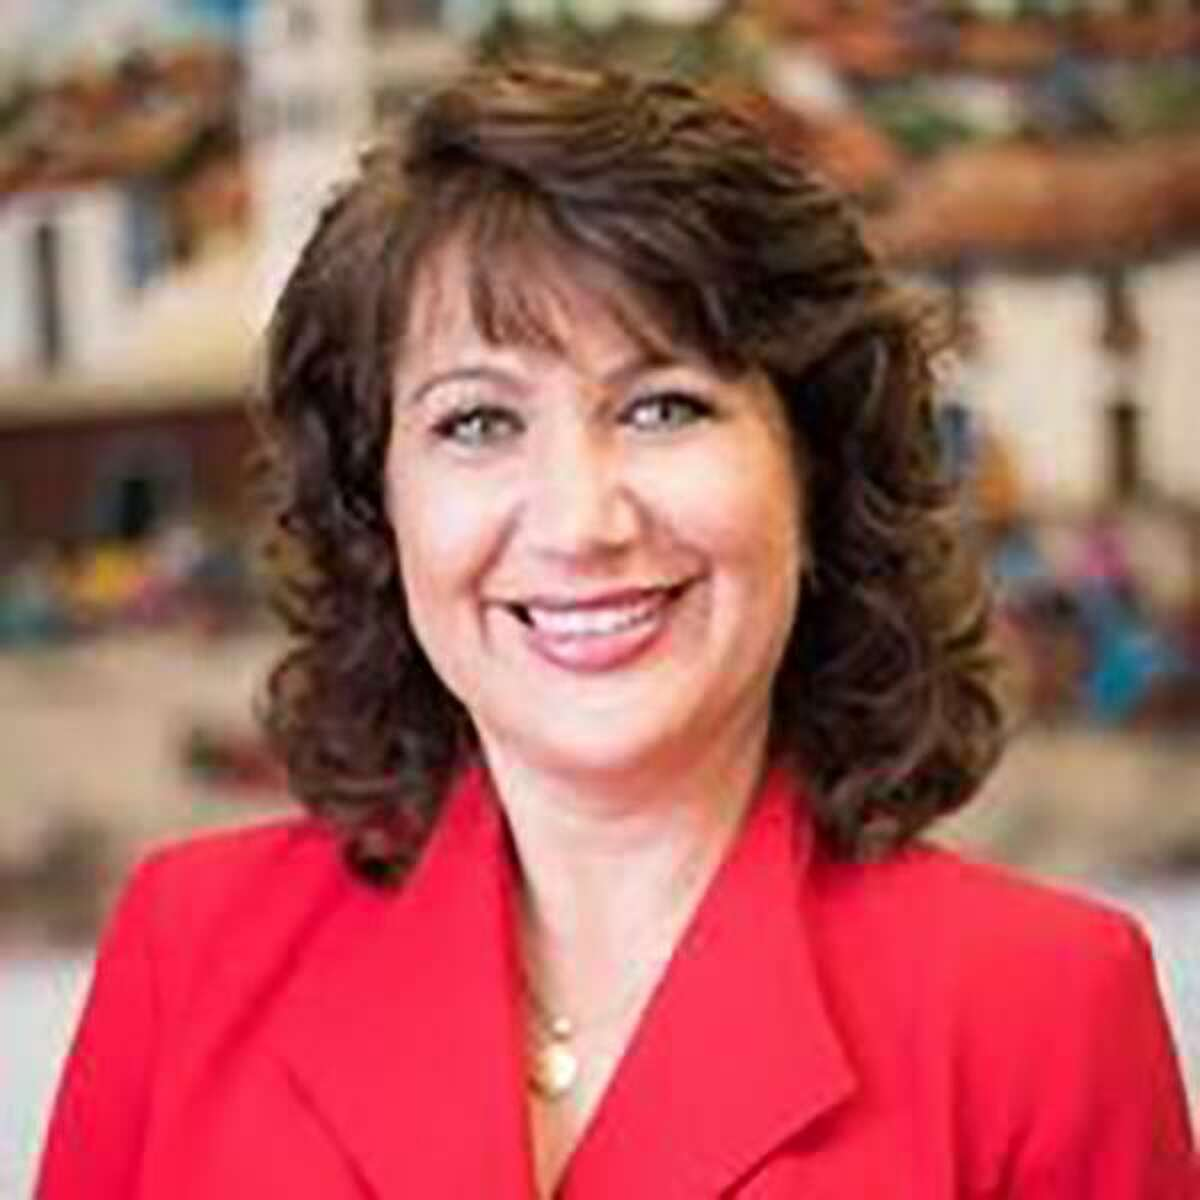 Dr. Sandra Guerra is the new deputy public health director at the San Antonio Metropolitan Health District.